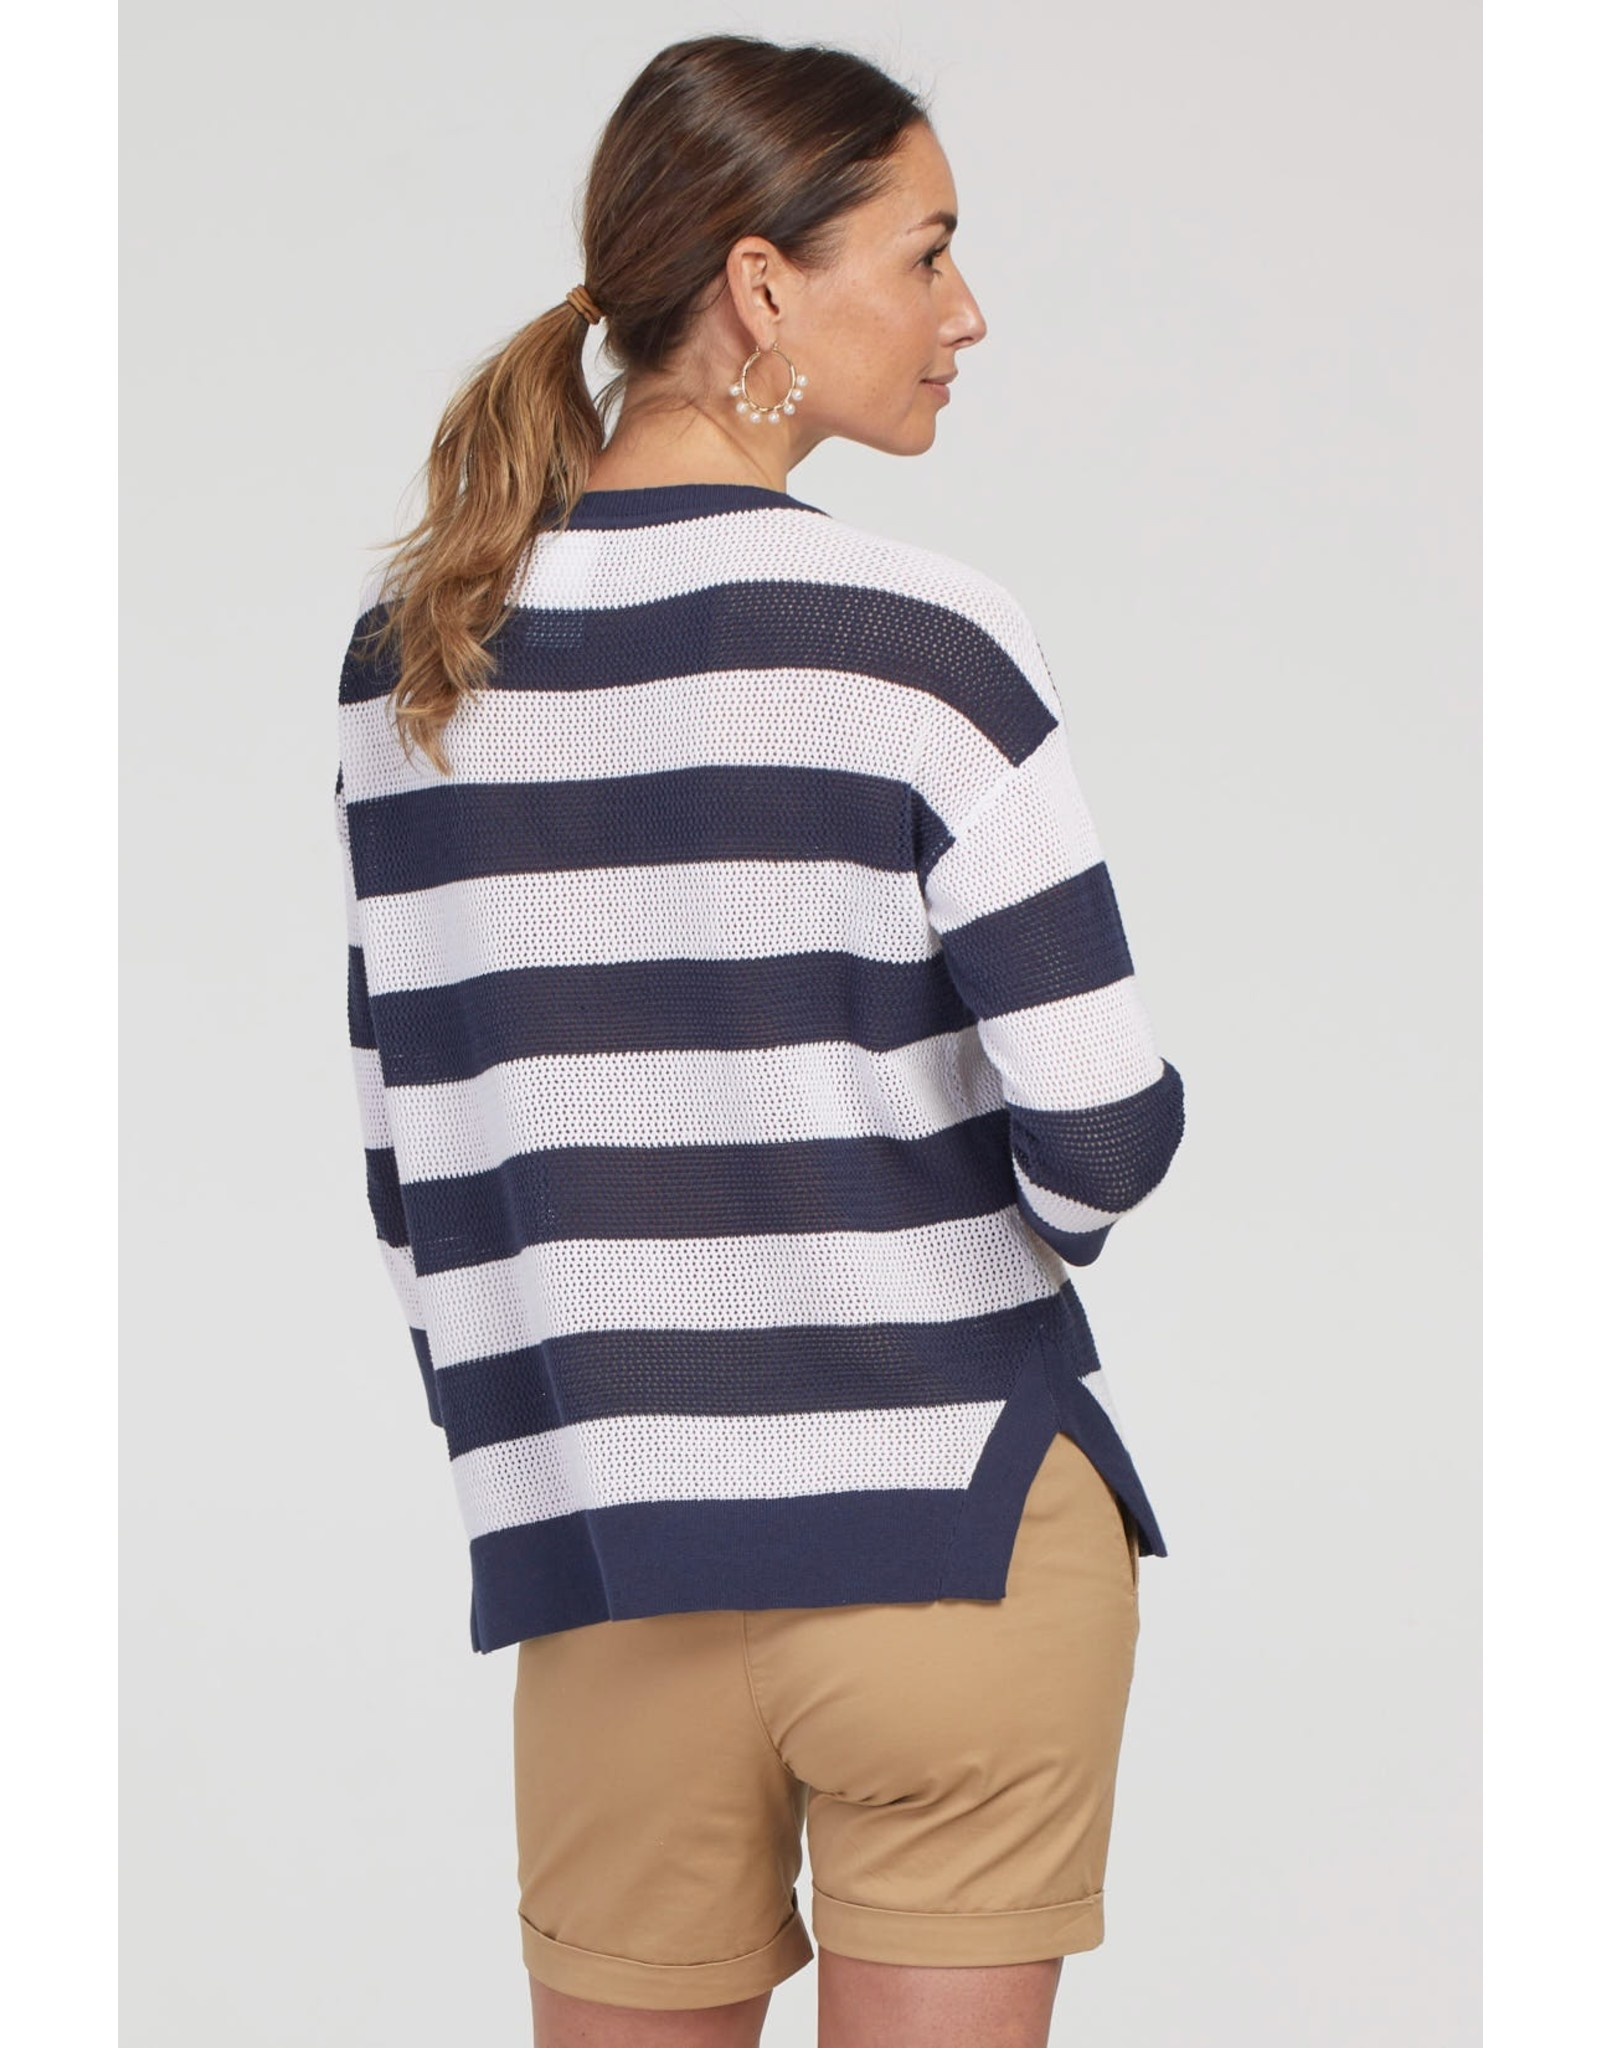 Tribal 3/4 Sleeve Sweater 44230 (S1)